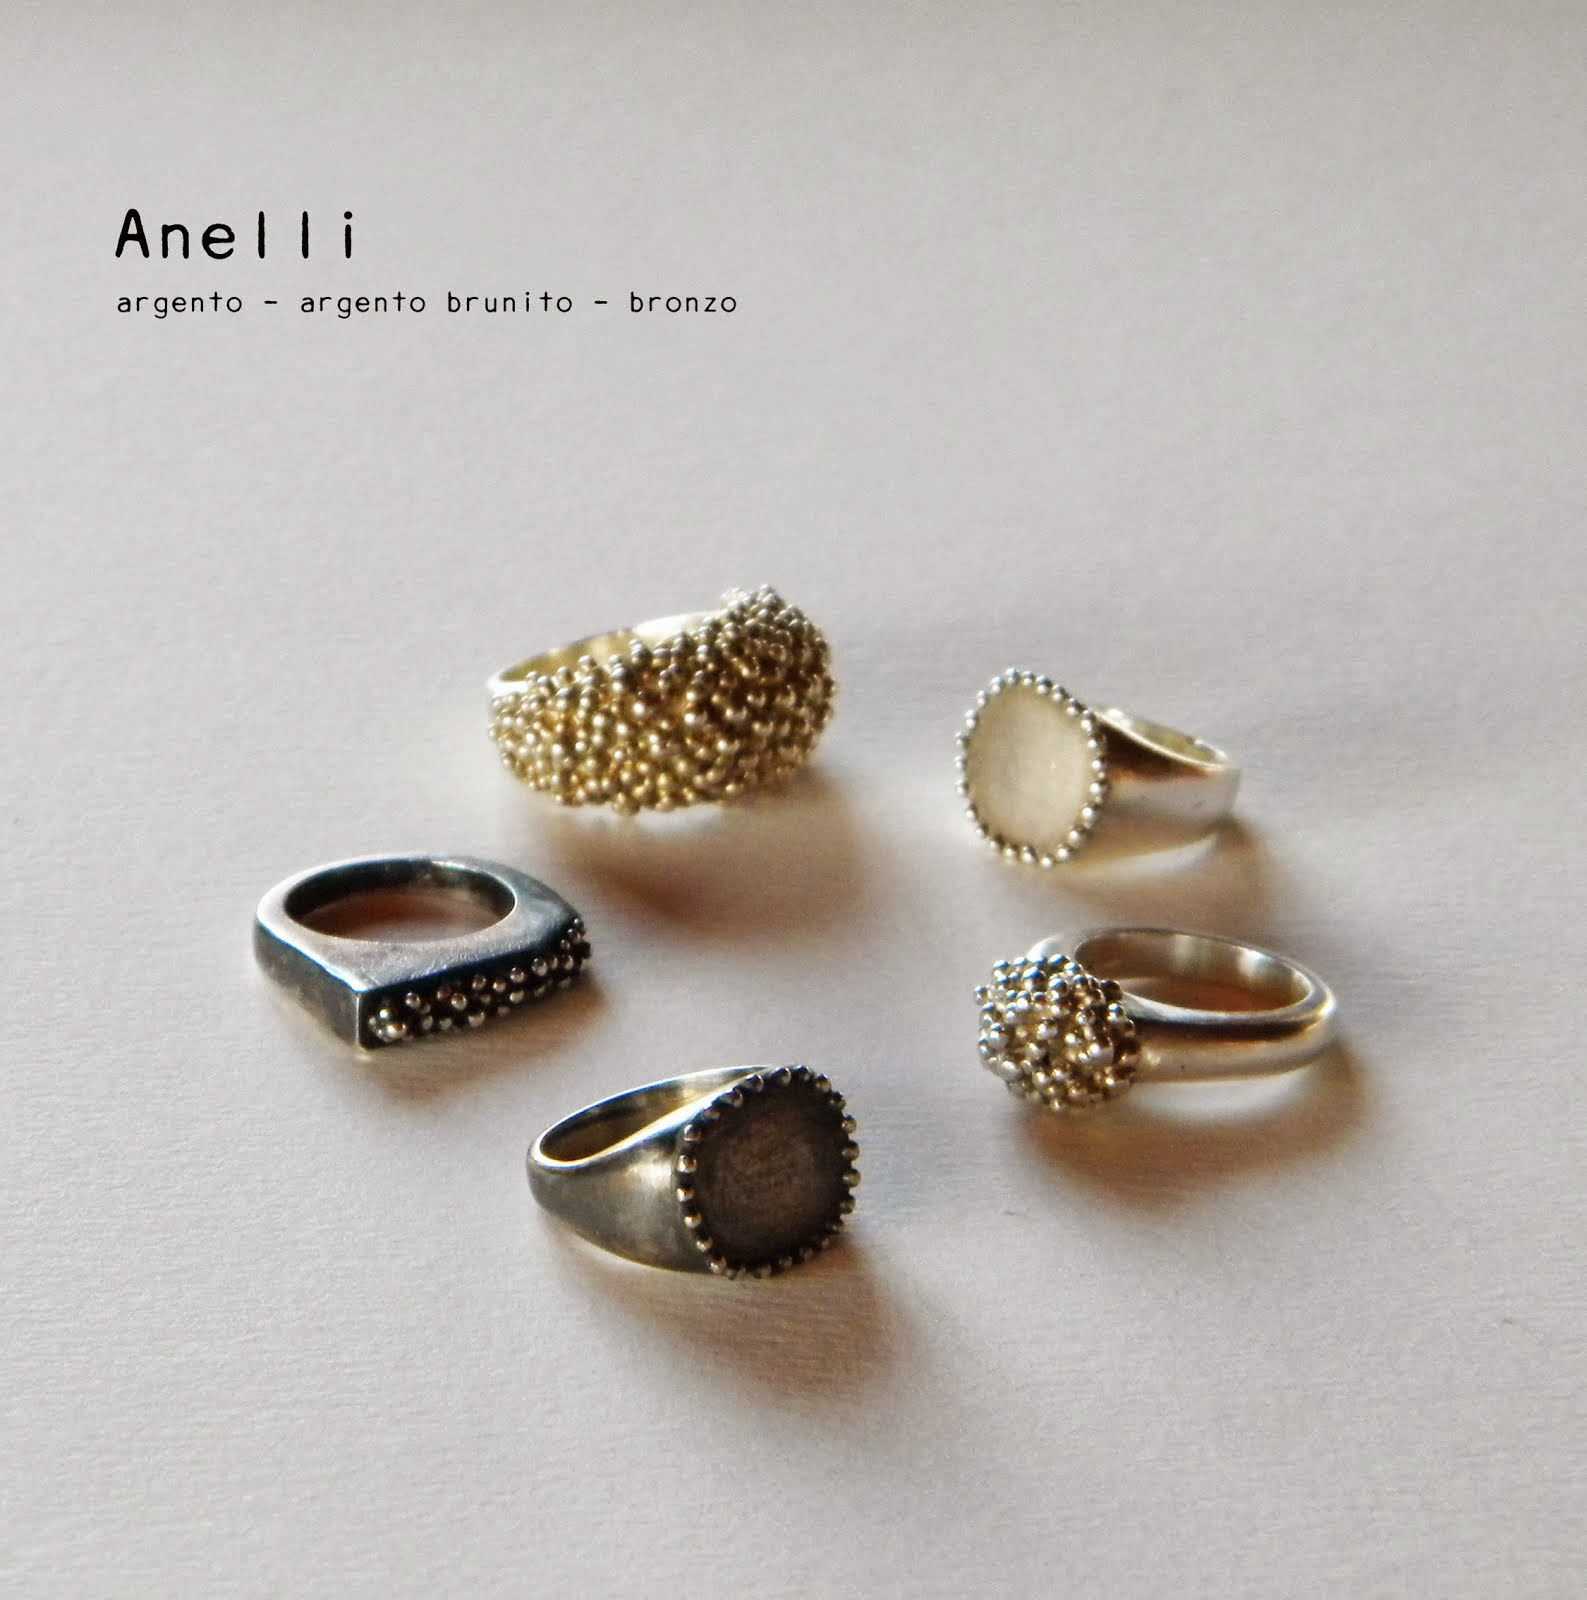 Anelli…PART II